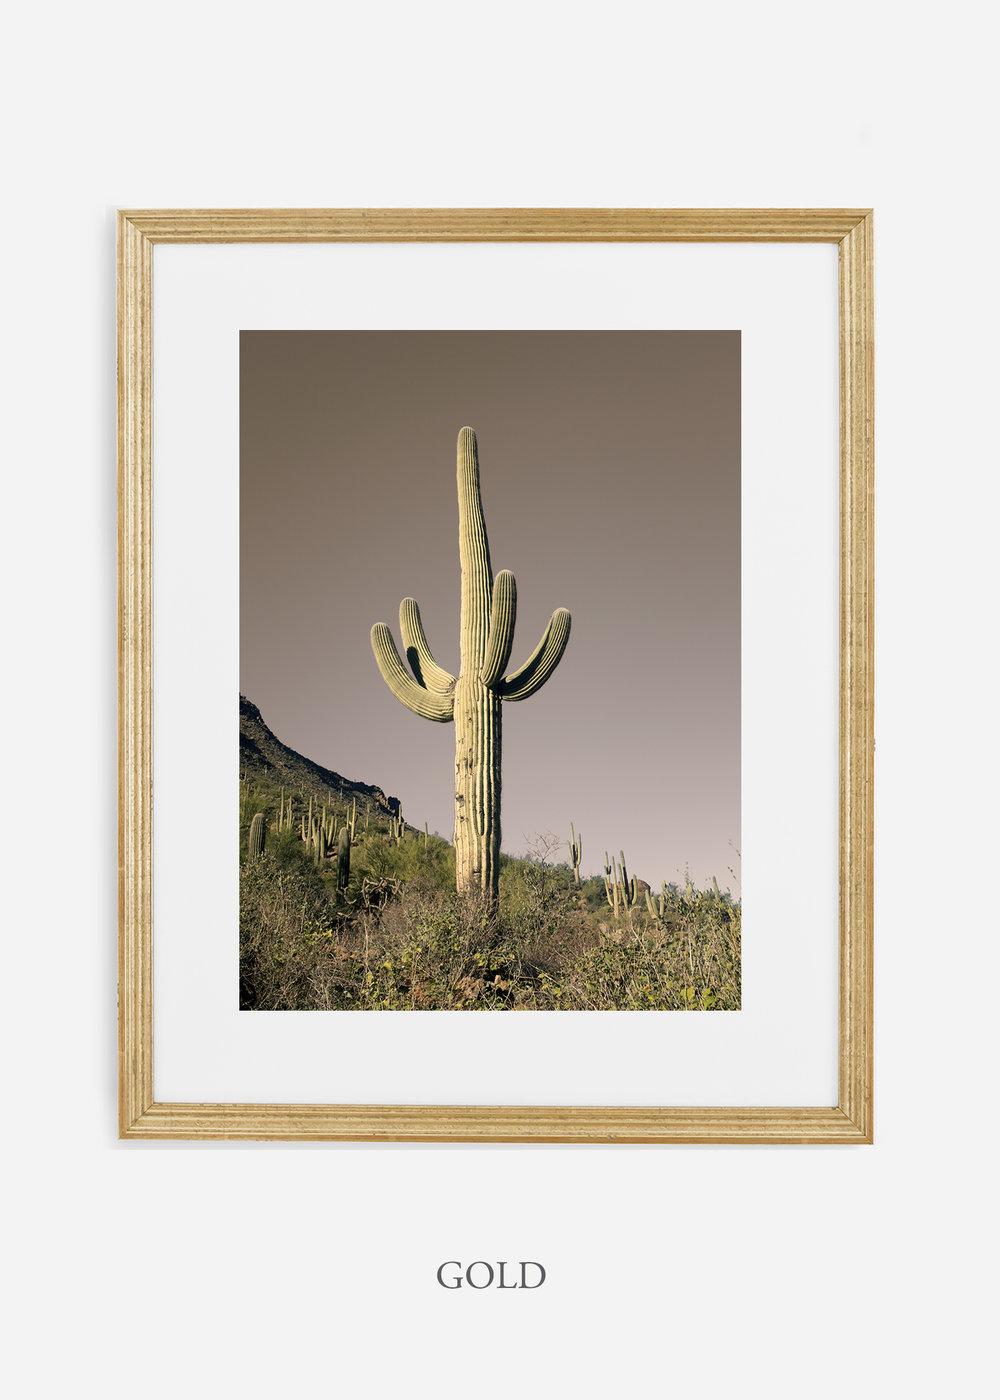 goldframe-saguaroNo.20-wildercalifornia-art-wallart-cactusprint-homedecor-prints-arizona-botanical-artwork-interiordesign.jpg